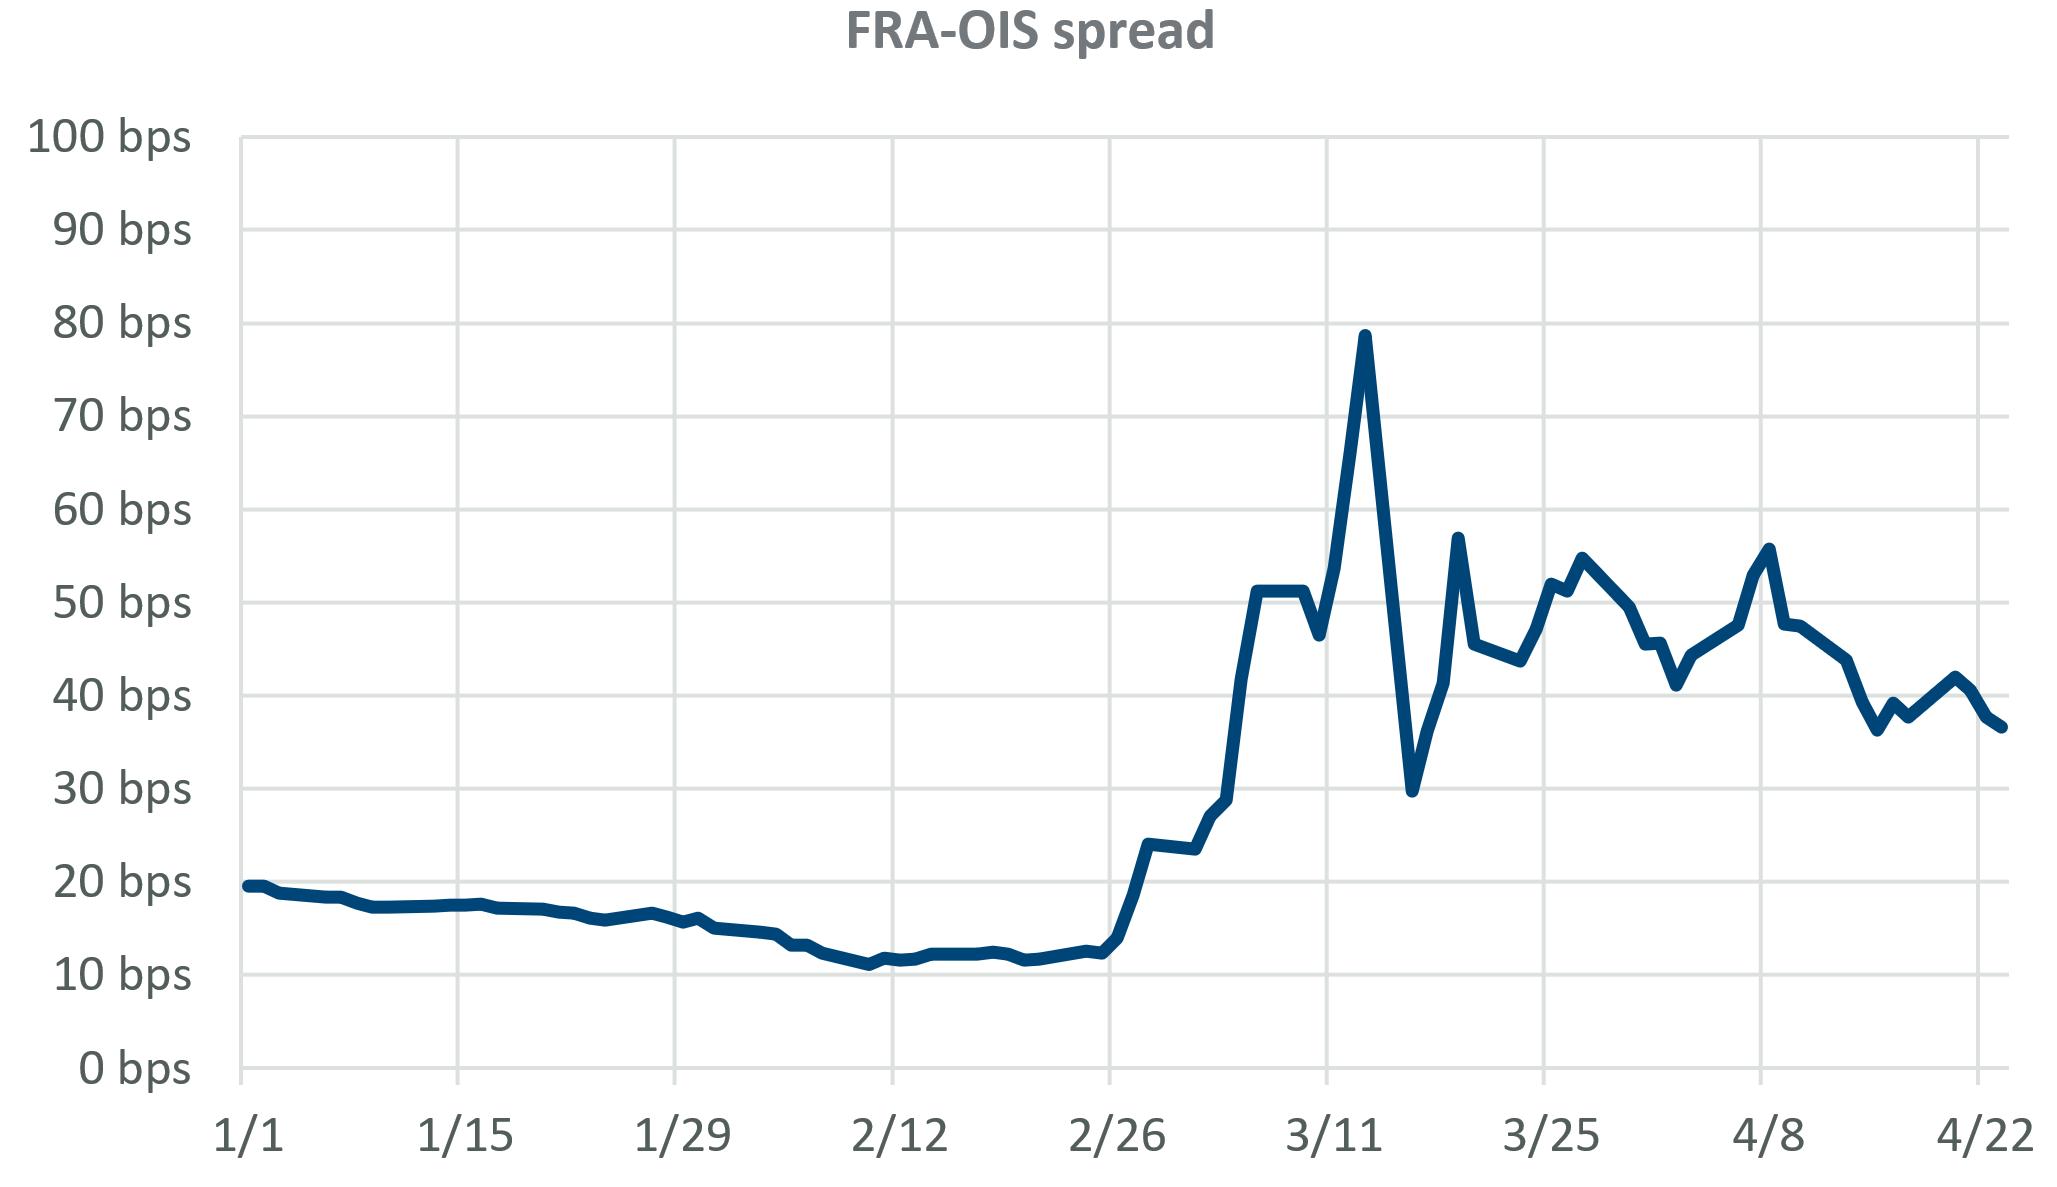 FRA-OIS spread